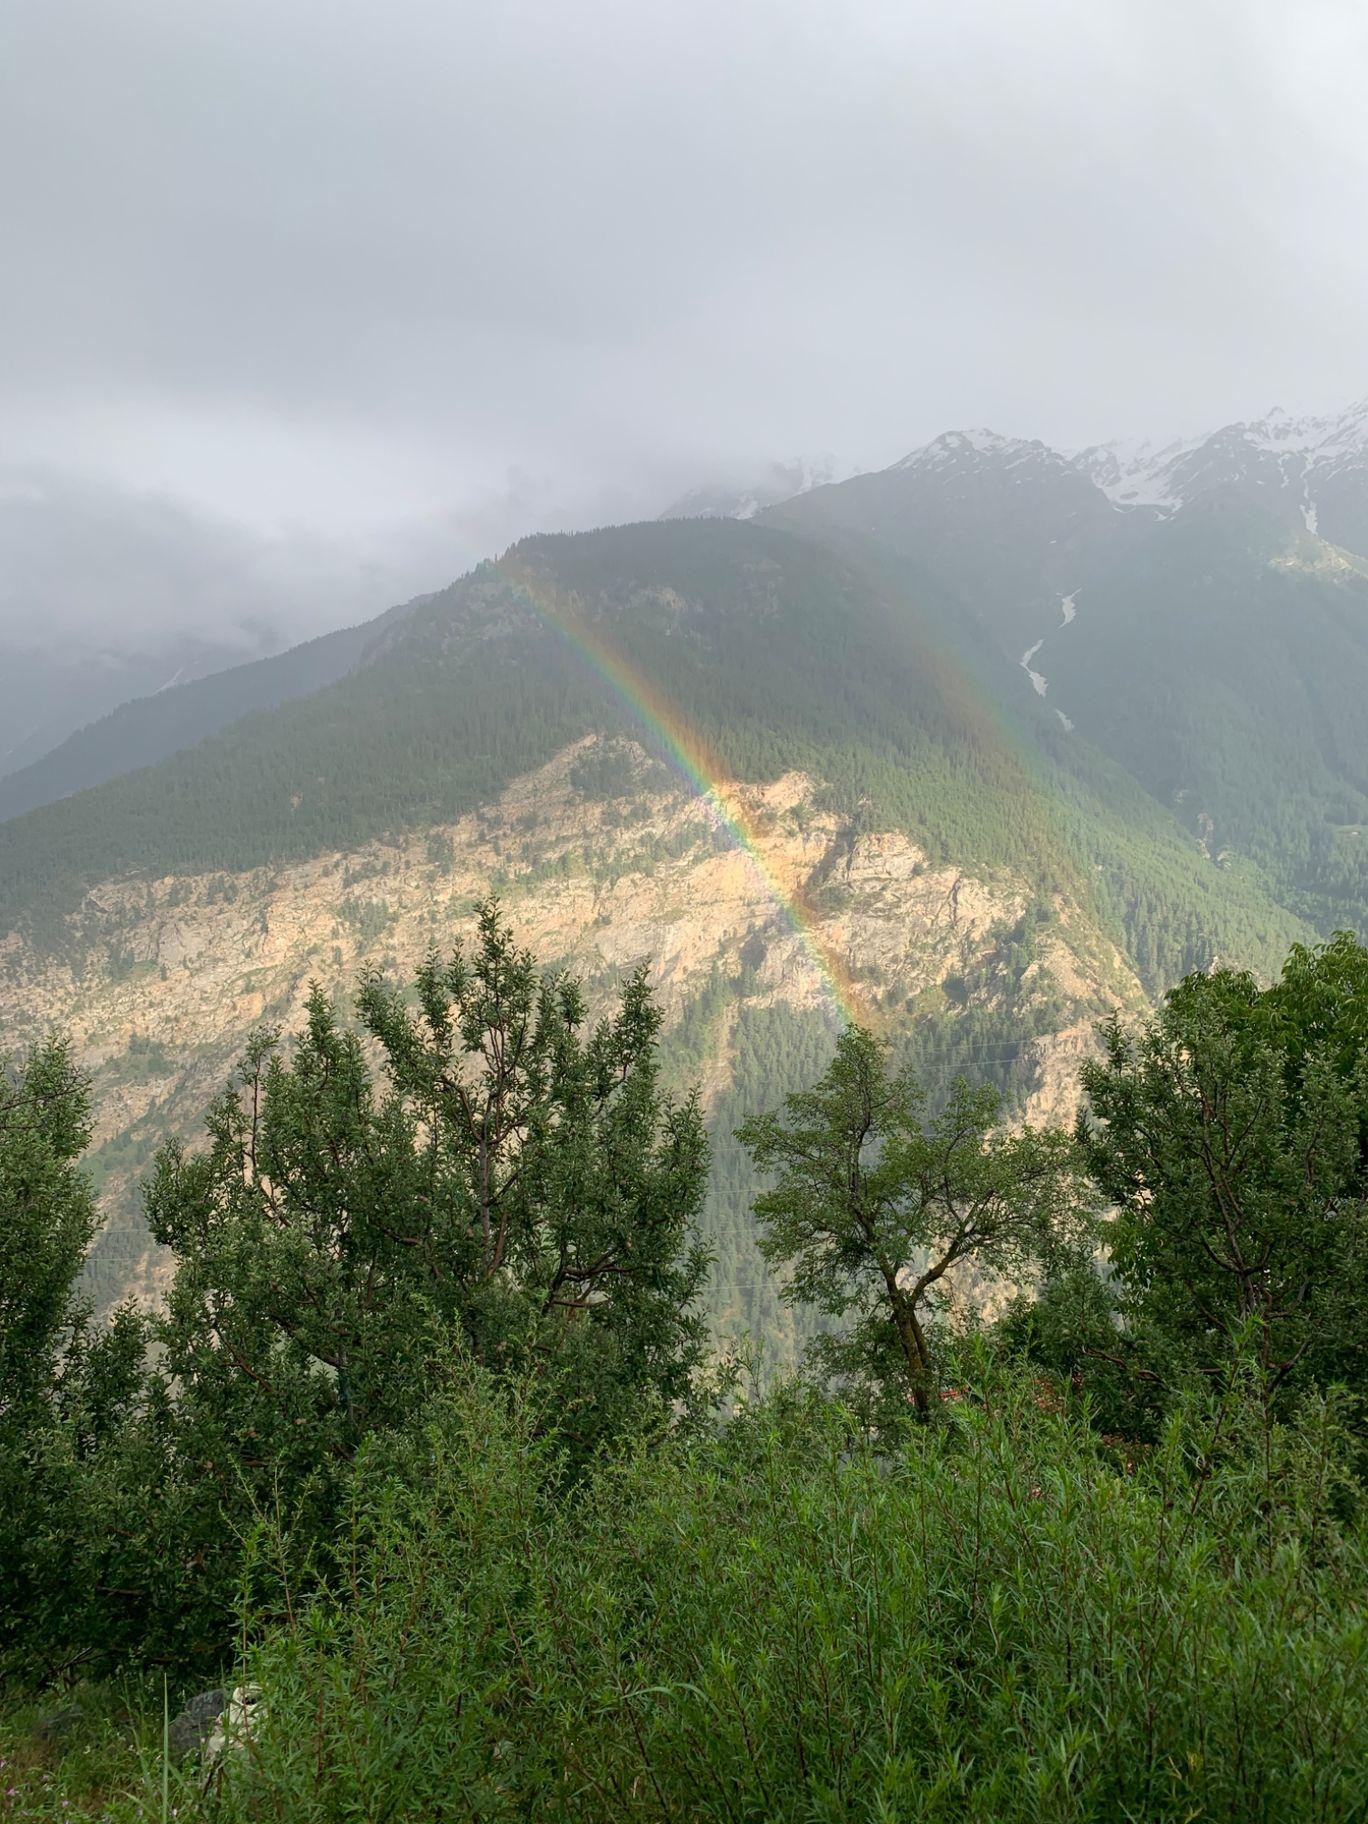 Photo of Himachal Pradesh By Shubham Choudhary